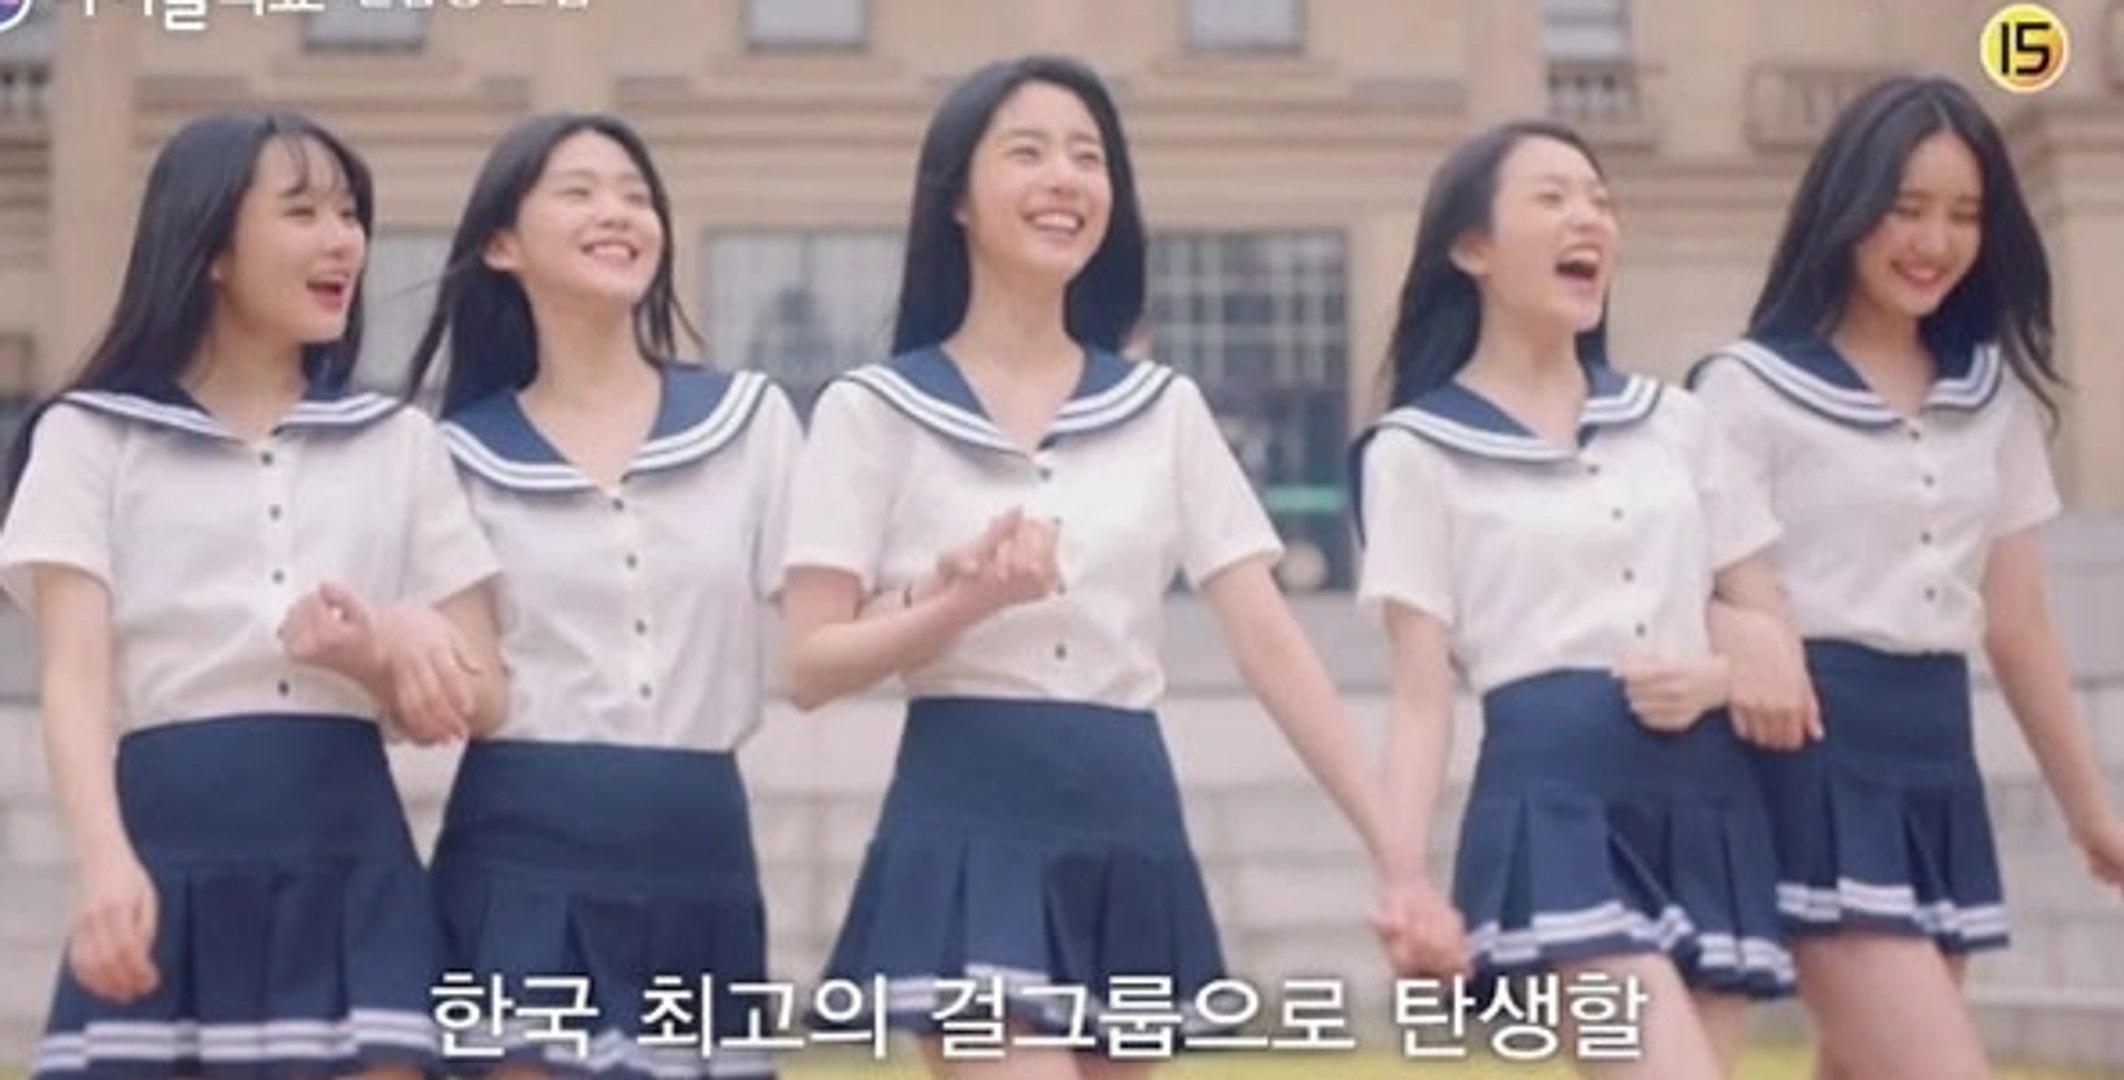 School 2017 Season 1 Episode 6 Full Episode Free Sub English,